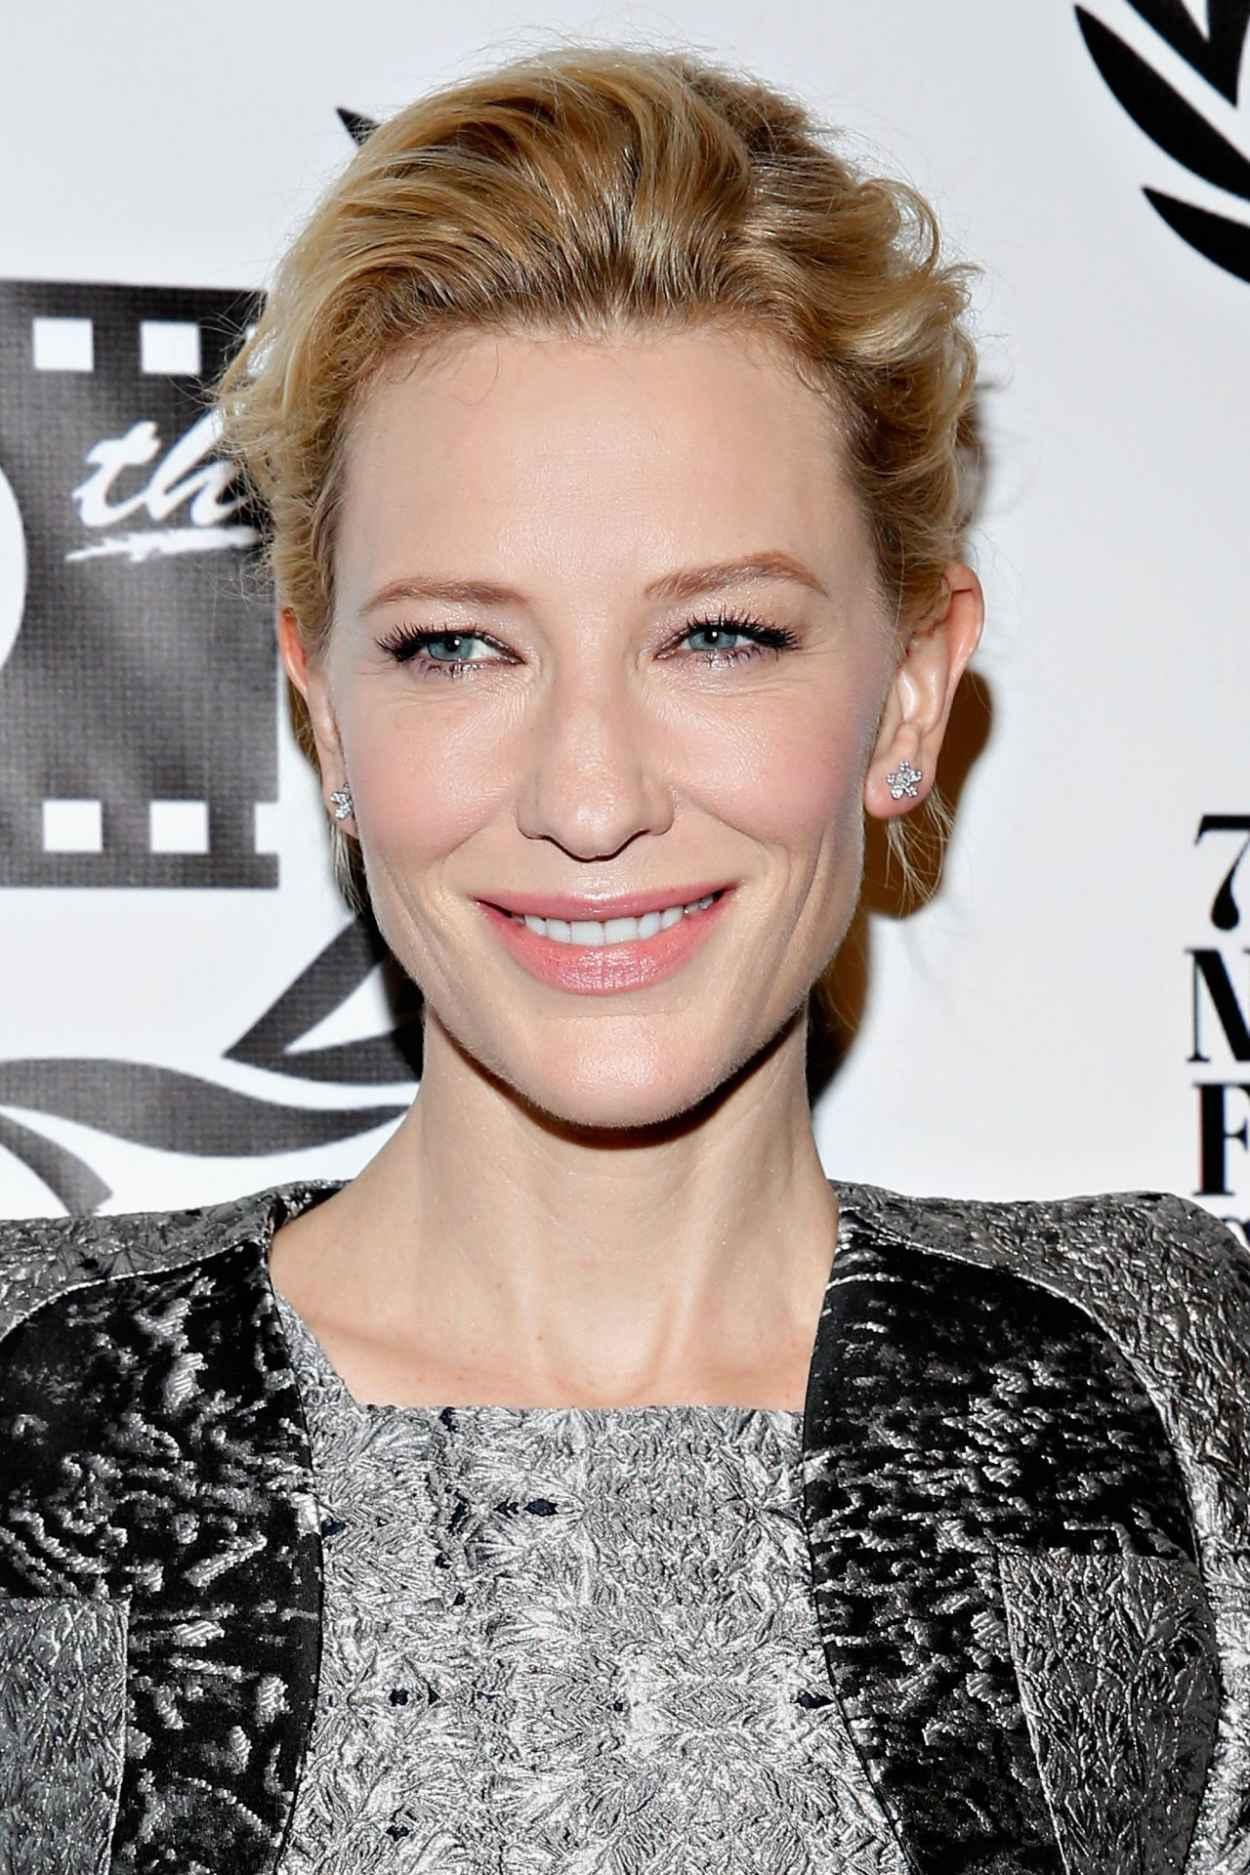 Cate Blanchett - N.Y. Film Critics Circle Awards Ceremony at The Edison Ballroom in New York, January 2015-1